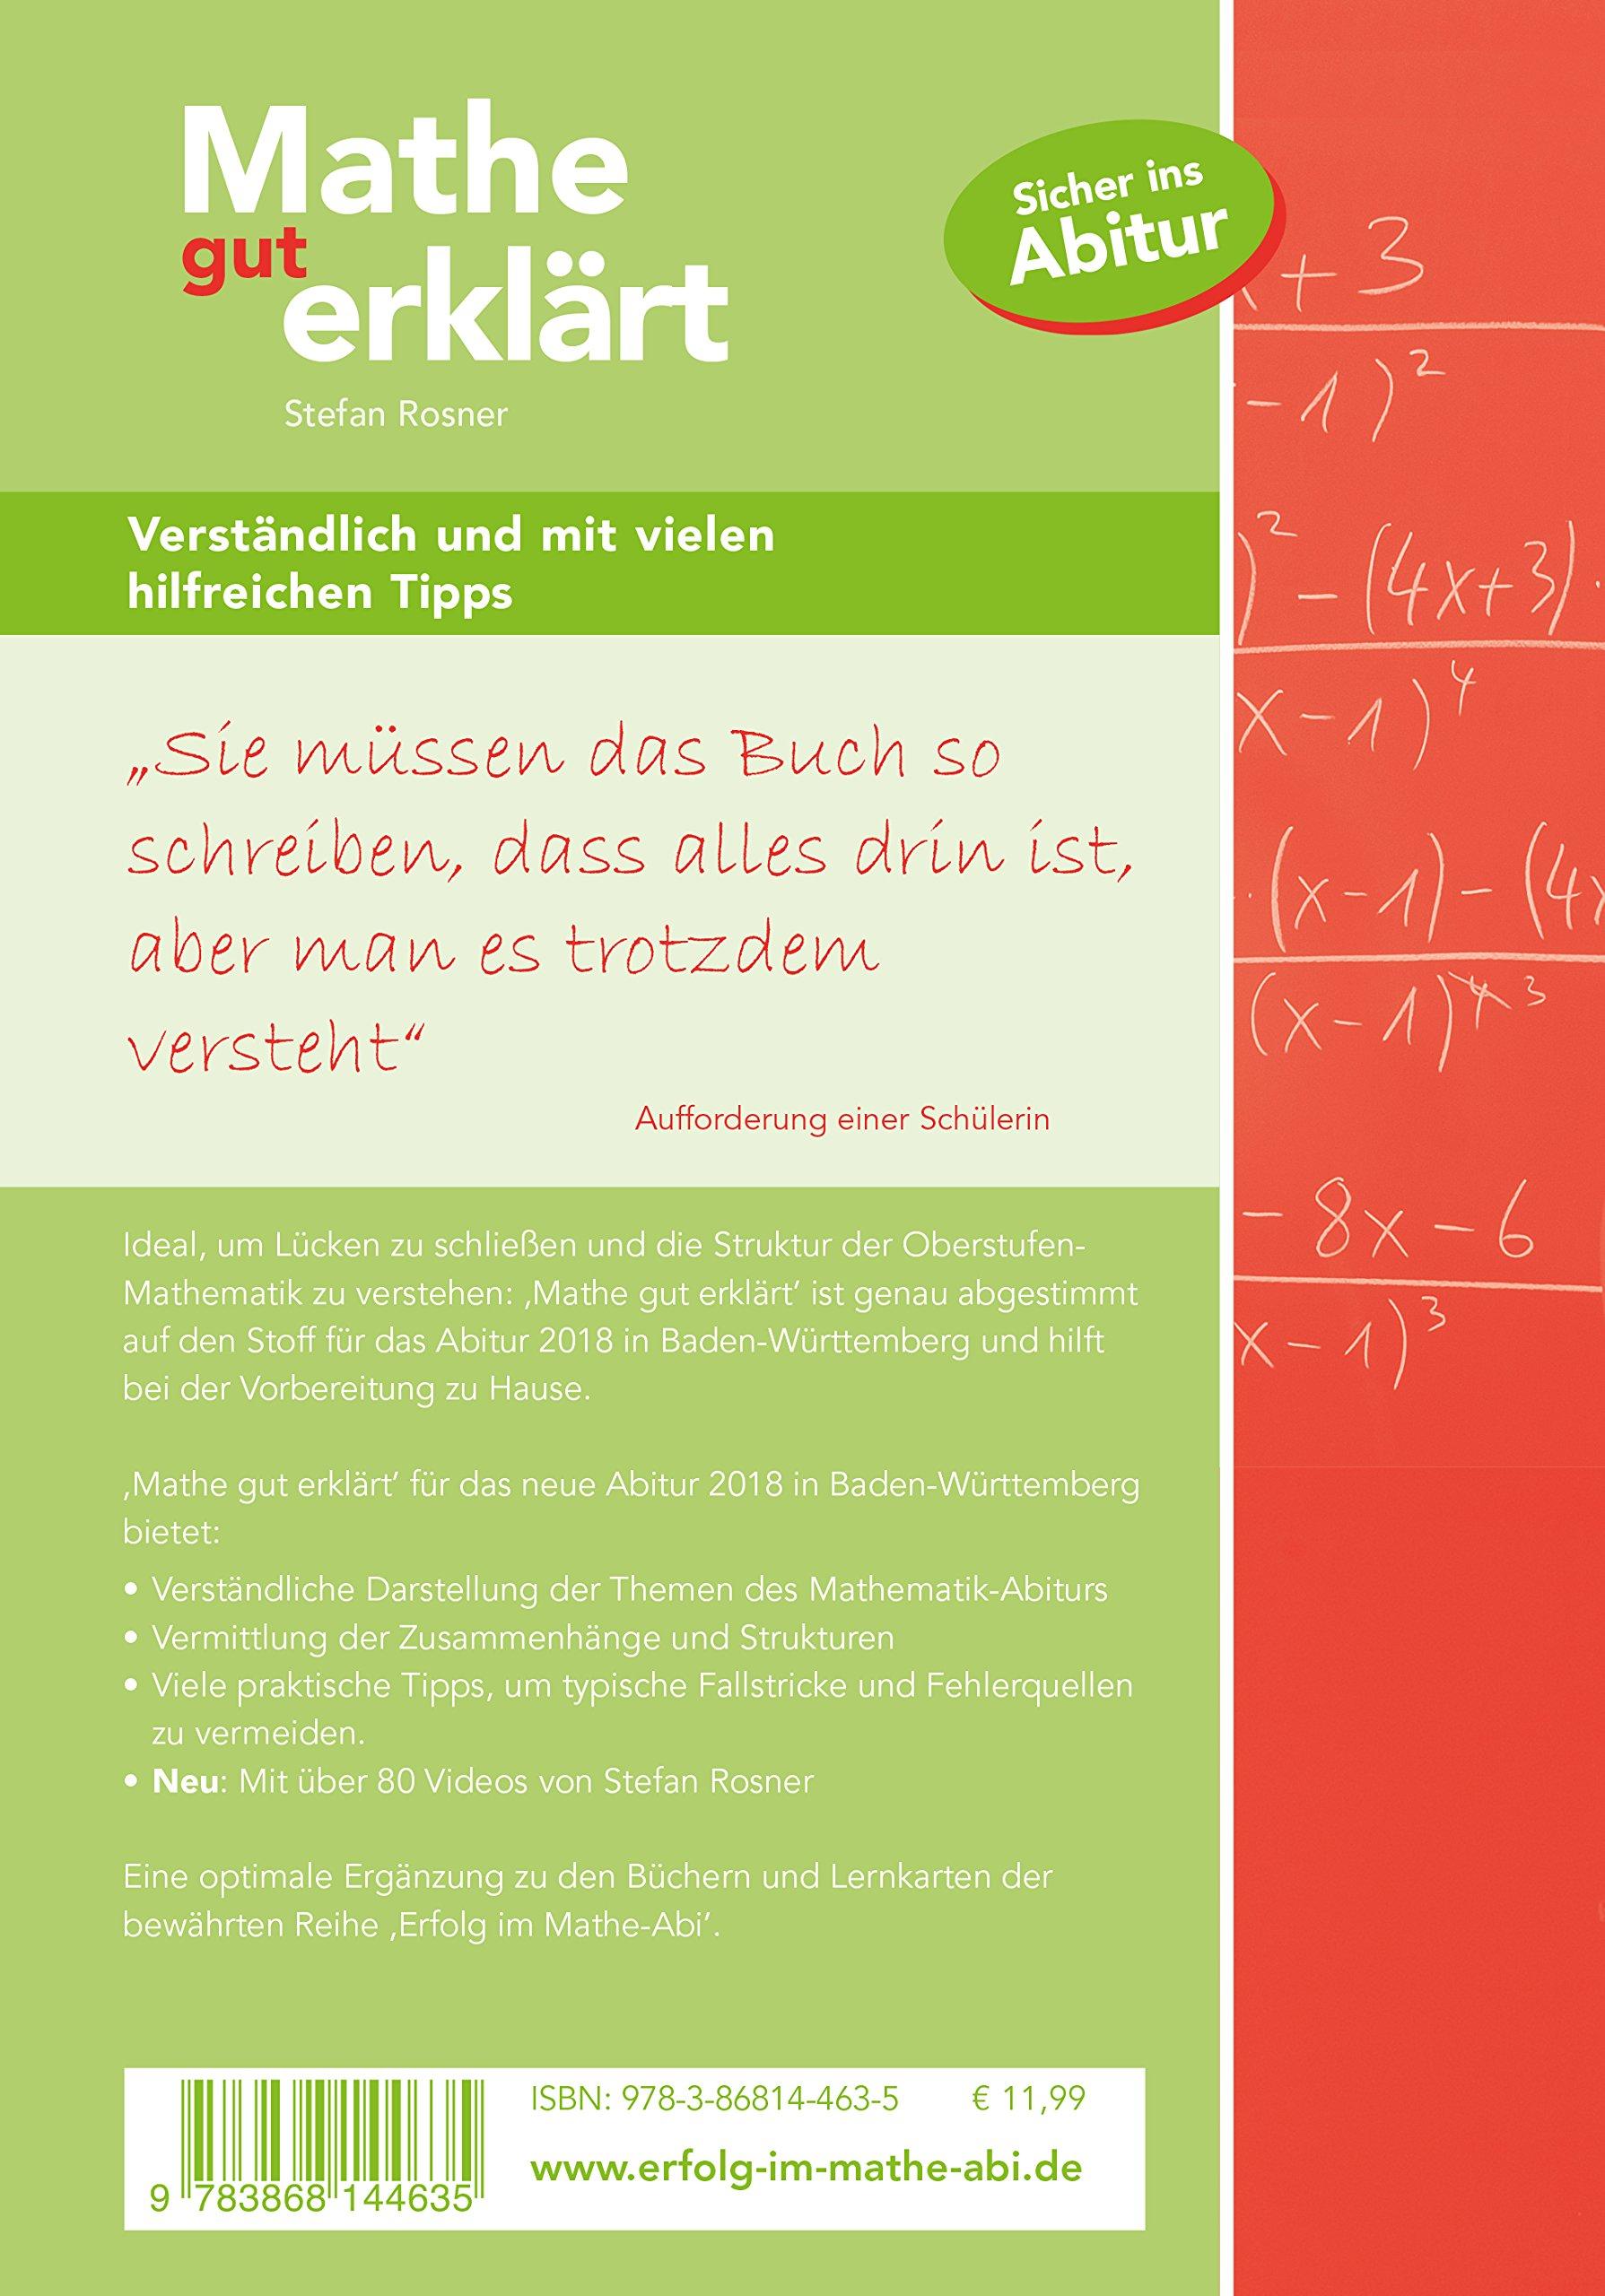 Mathe gut erklärt 2018 Baden-Württemberg Gymnasium - Stefan Rosner ...